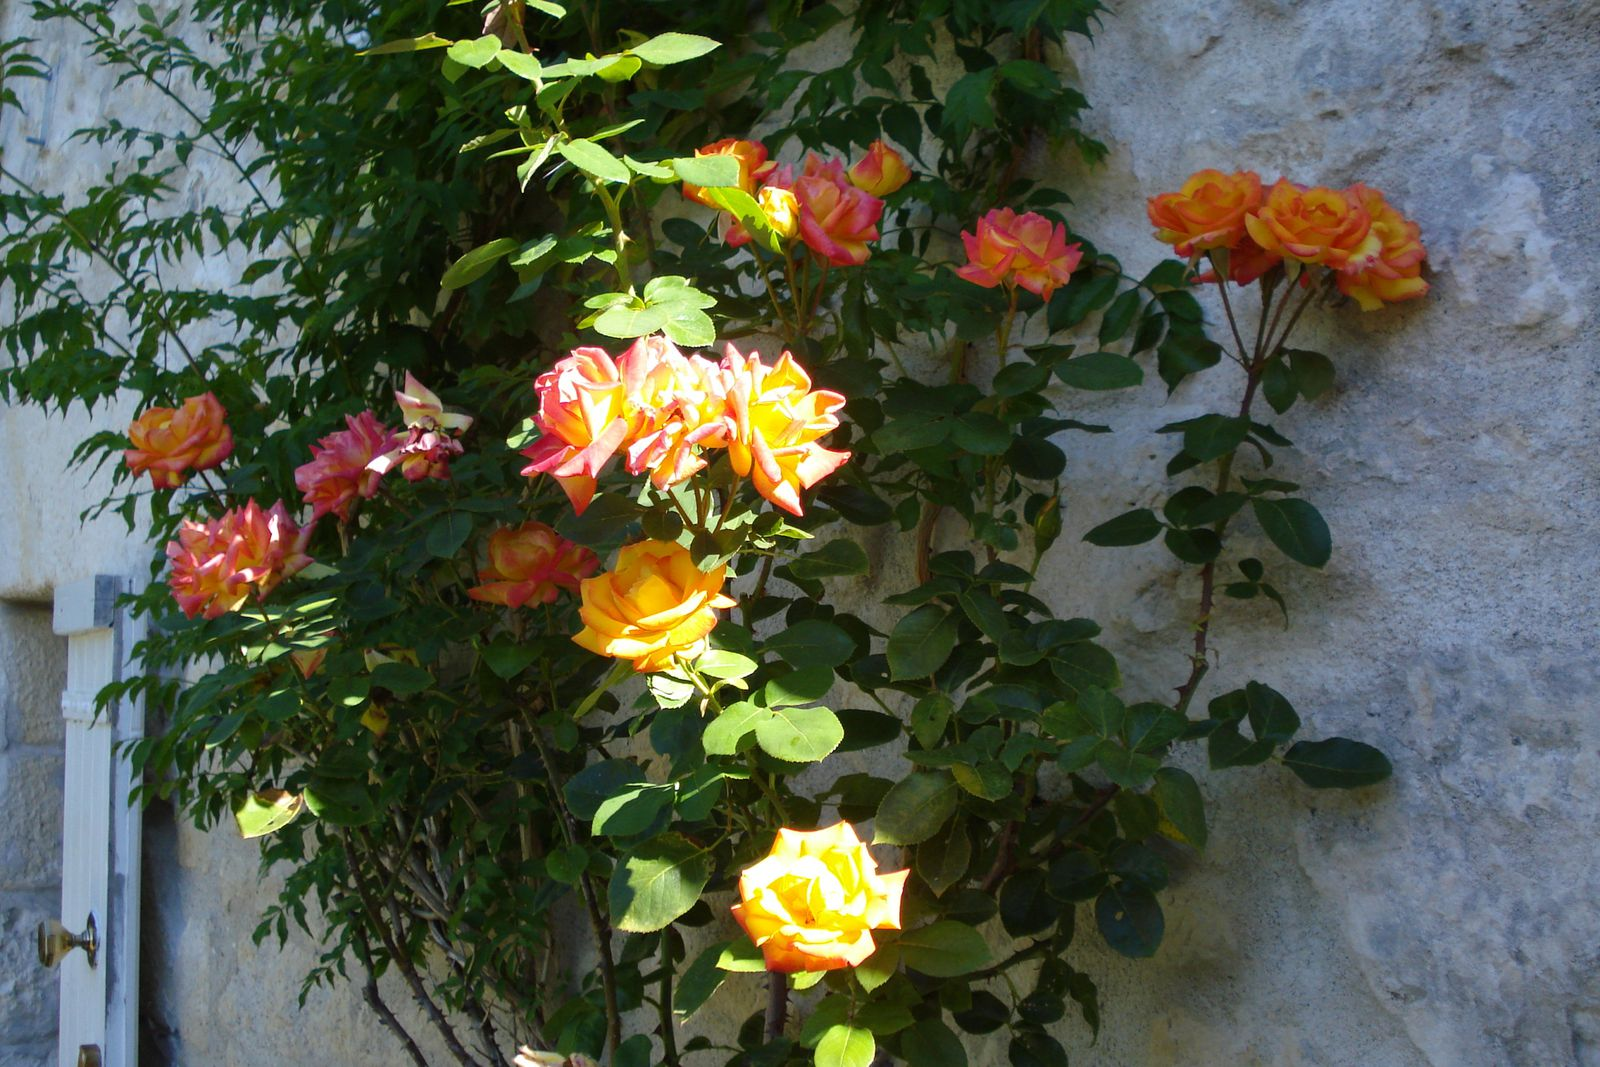 Dimanche pluvieux jardin heureux cagouille 39 s garden for Jardin 00 garden